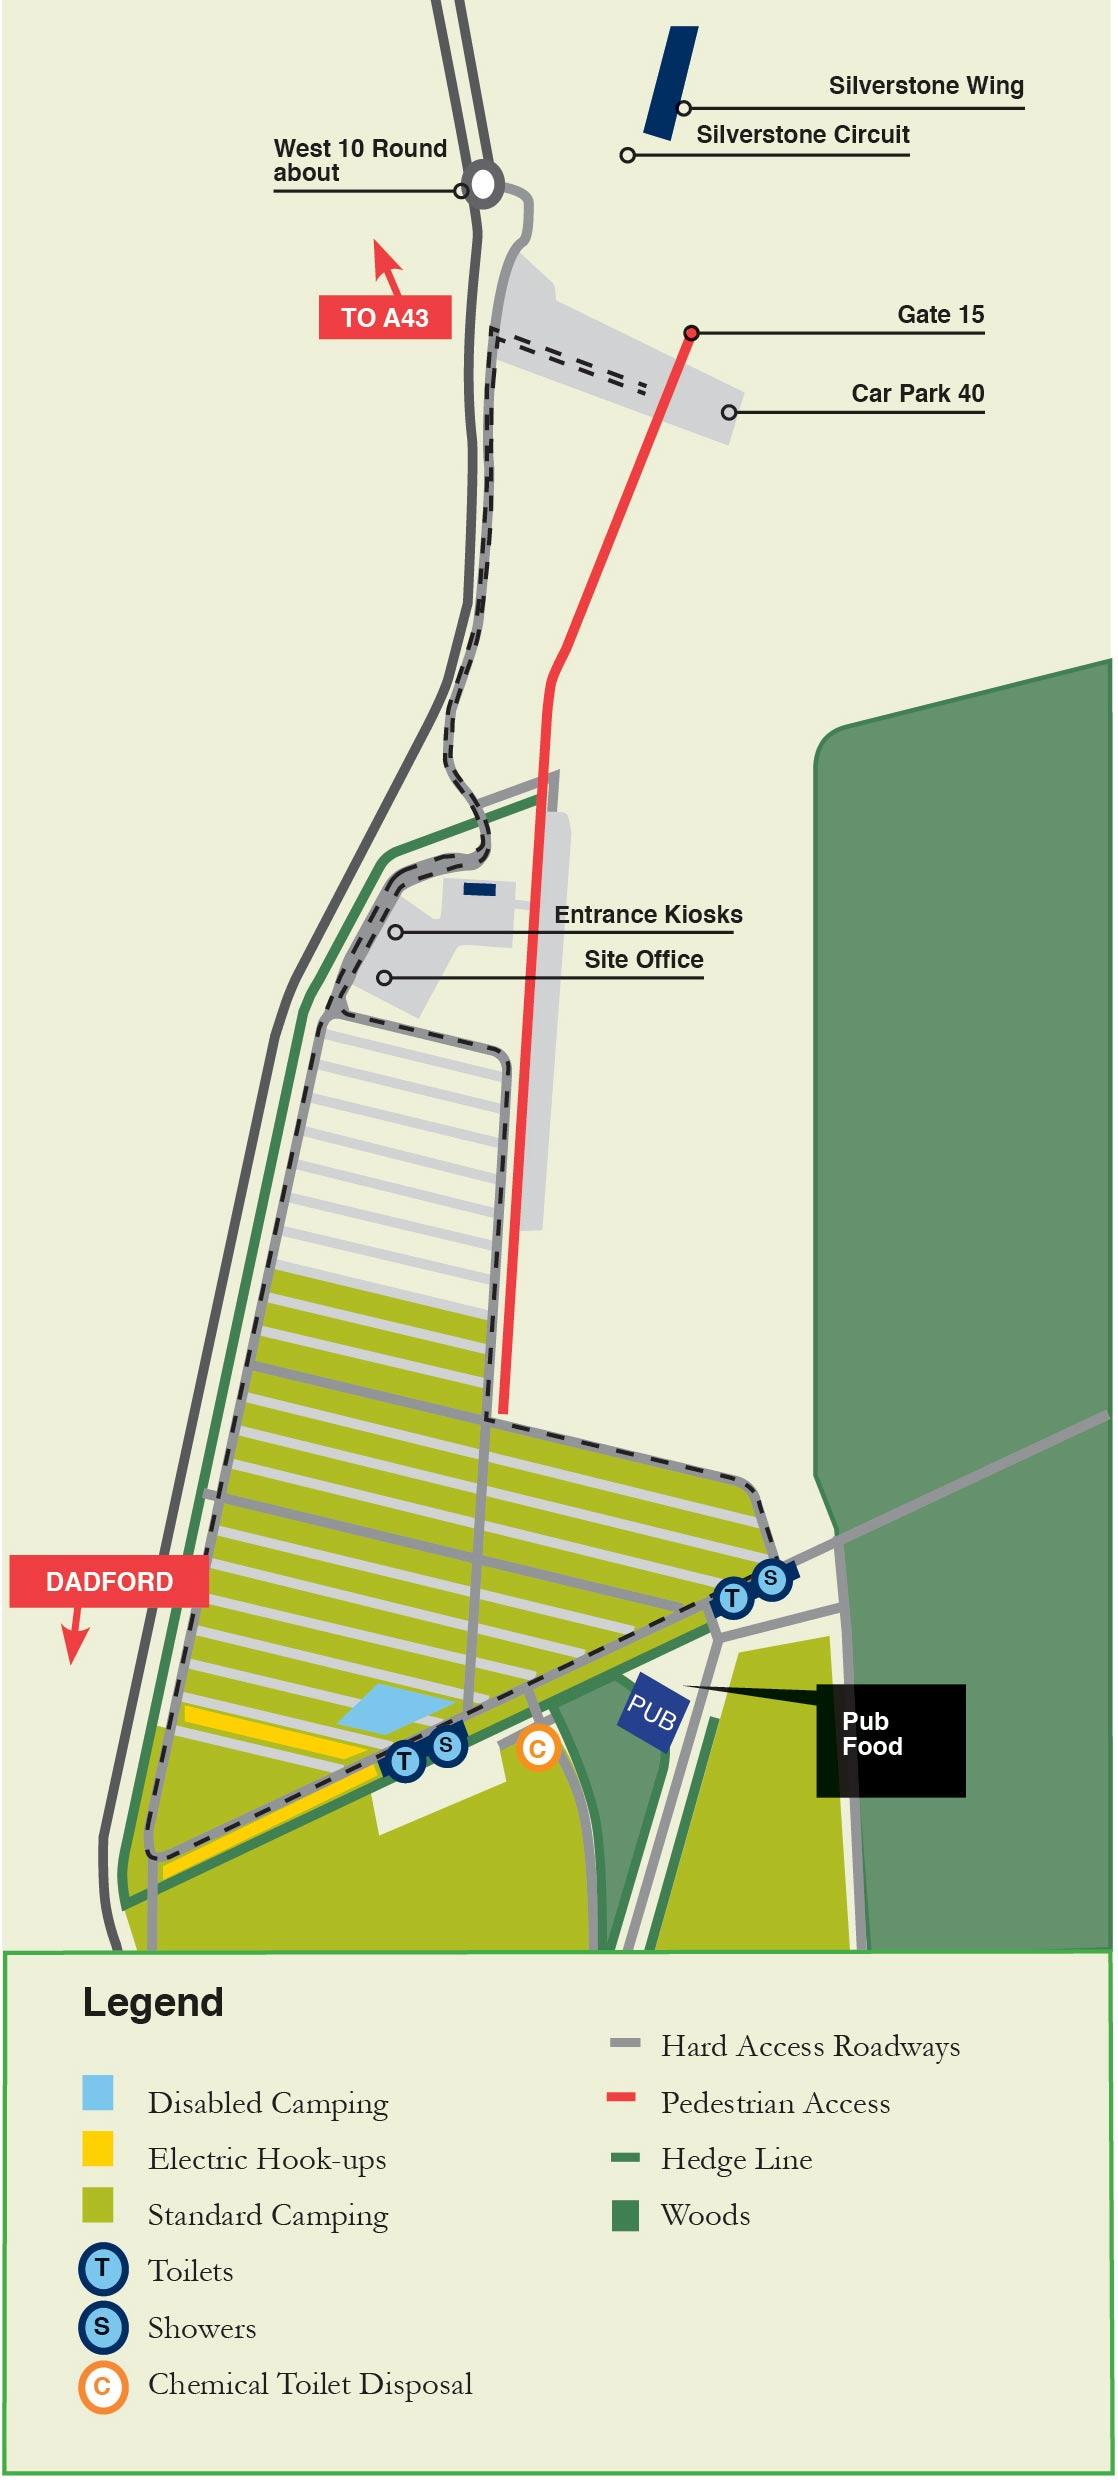 Map-BTCC-at-silverstone-woodlands-campsite-1200w.jpg